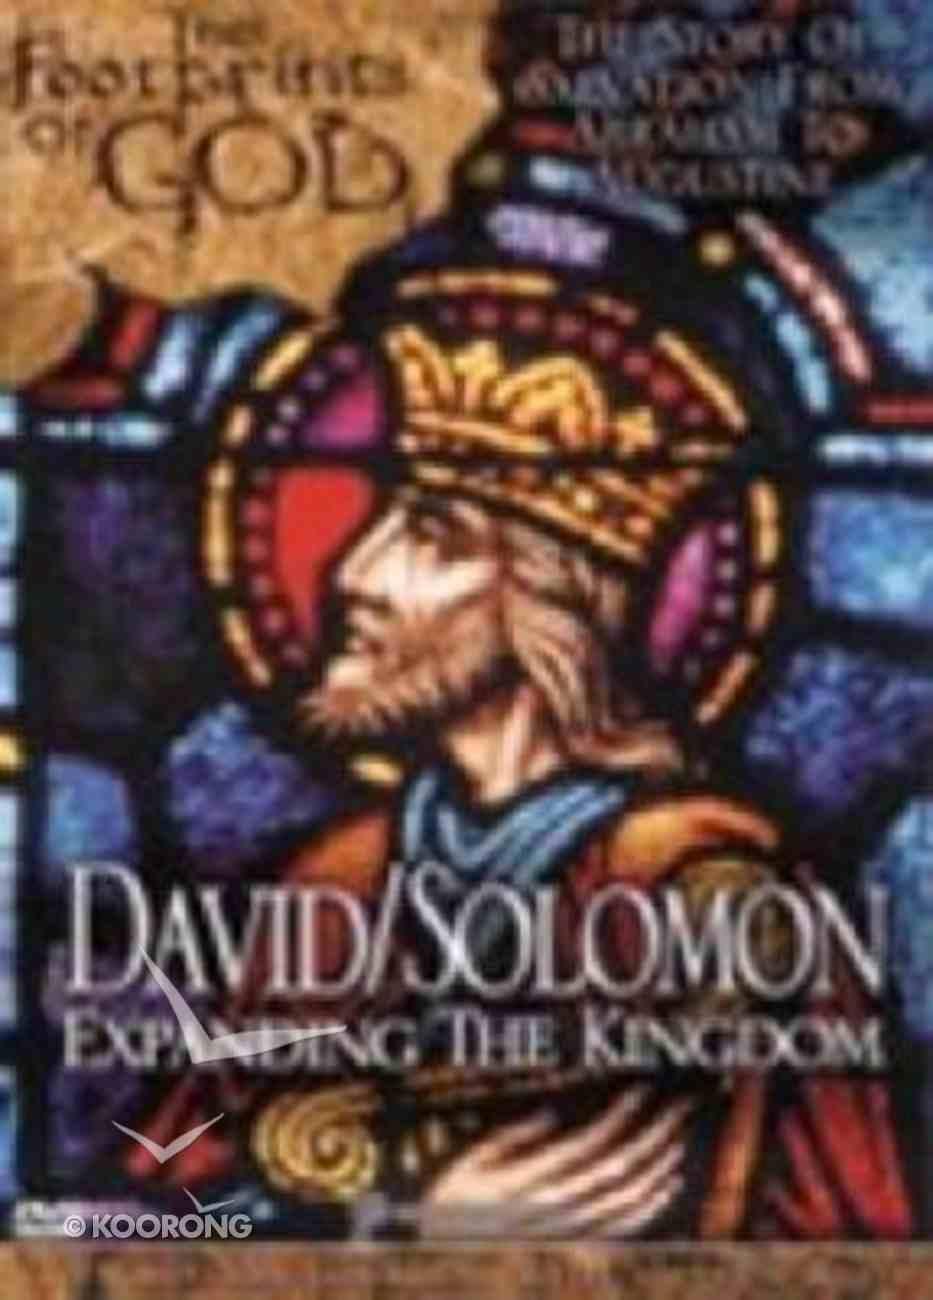 David/Solomon: Expanding the Kingdom DVD